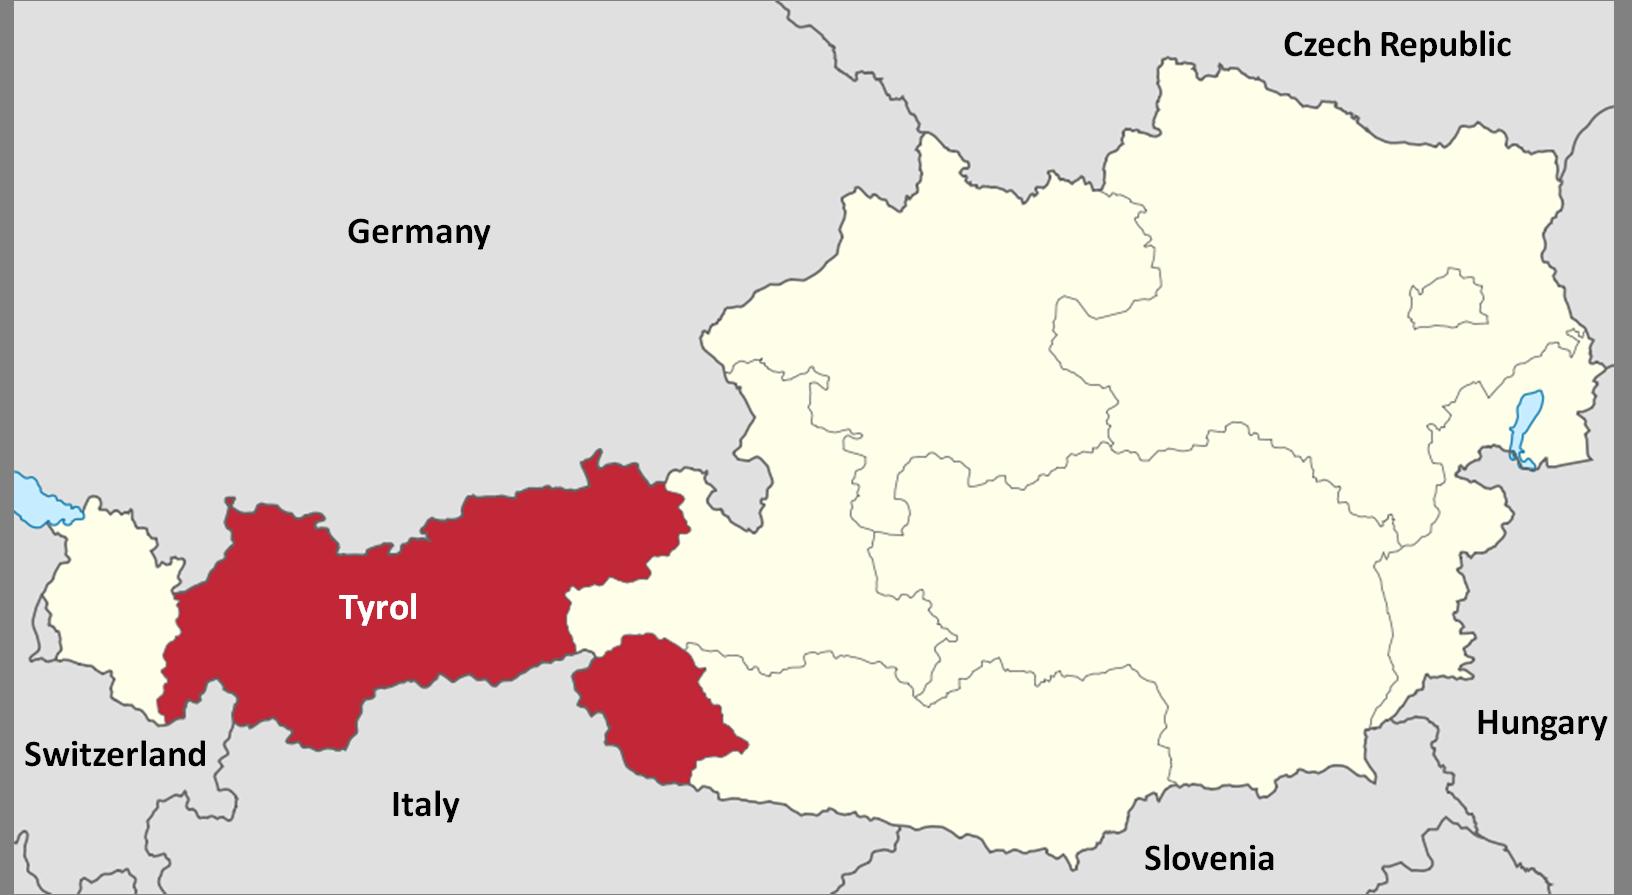 Tyrol and South Tyrol (Wikimedia)